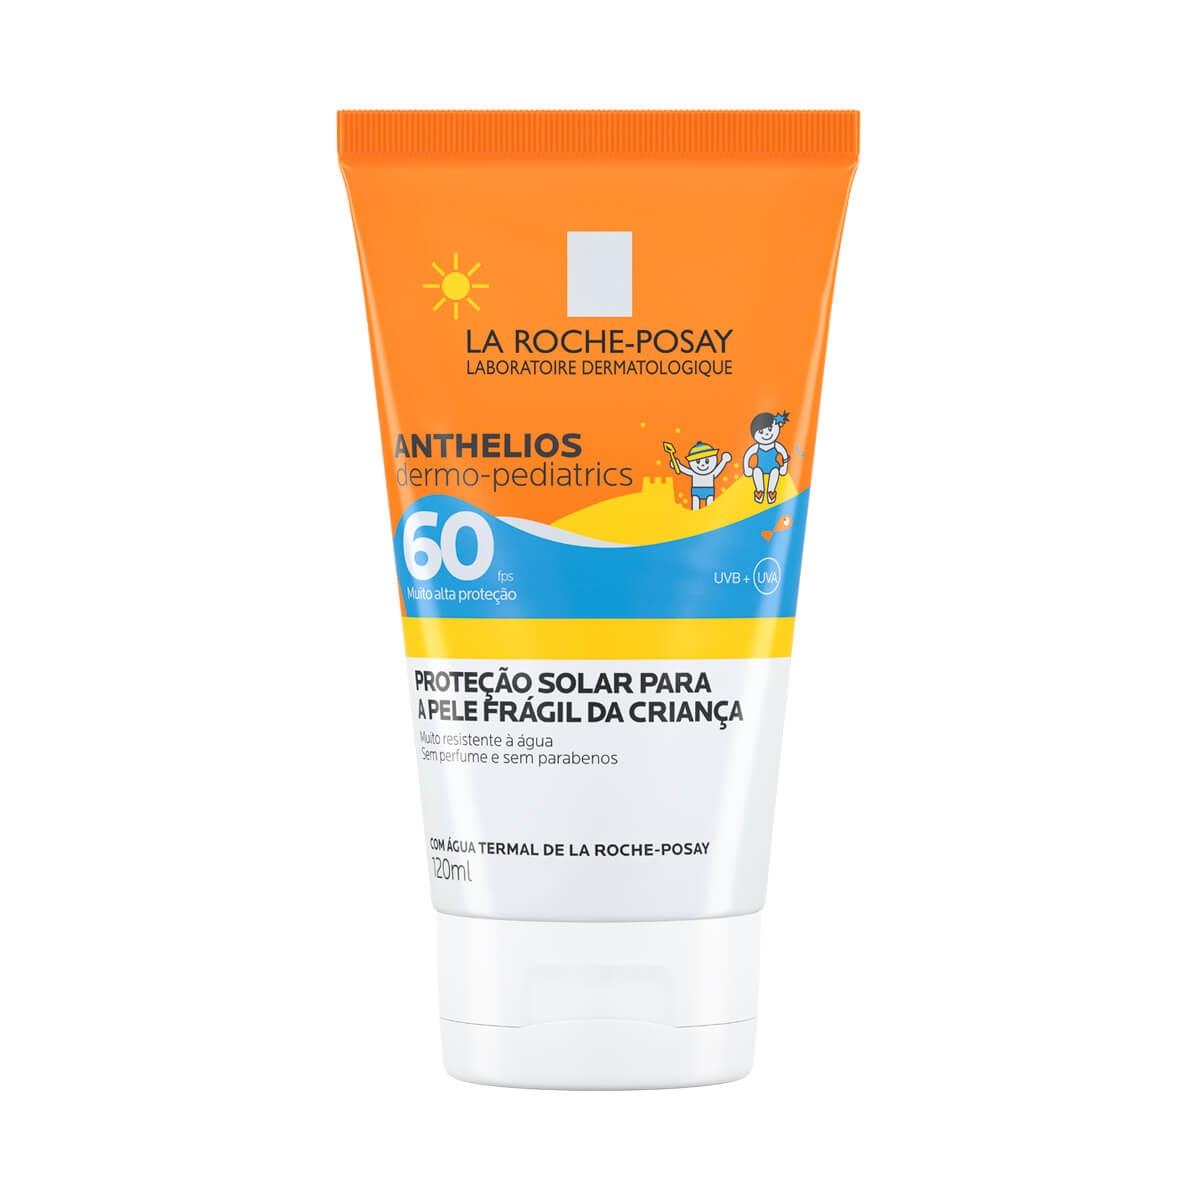 Protetor Solar Infantil La Roche-Posay Anthelios Dermo-Pediatrics FPS 60 com 120ml 120ml